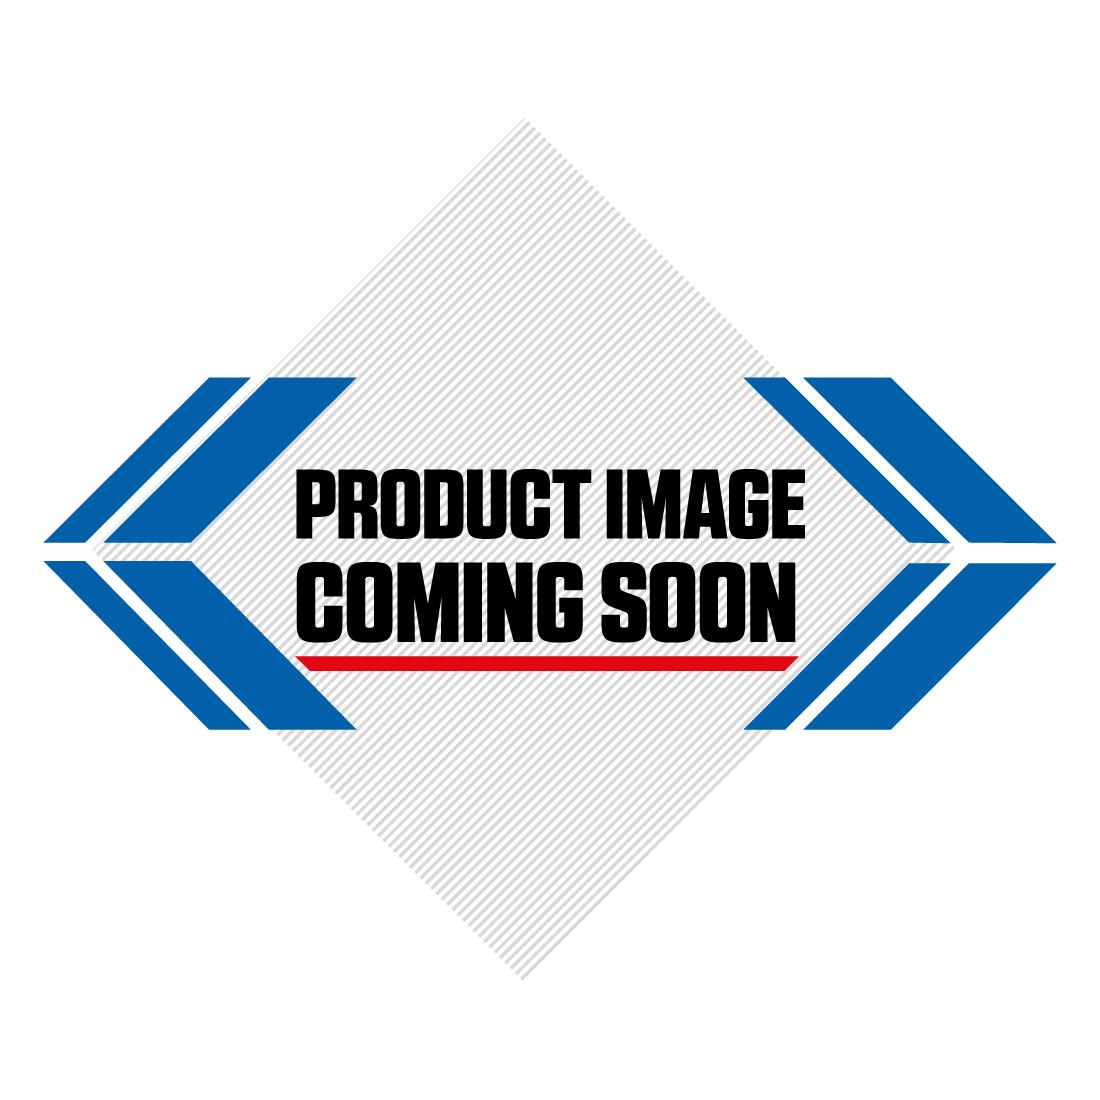 Renthal Twinring Rear Sprocket KTM SX SX-F EXC EXC-F Husqvarna TC FC TE FE - Orange Image-5